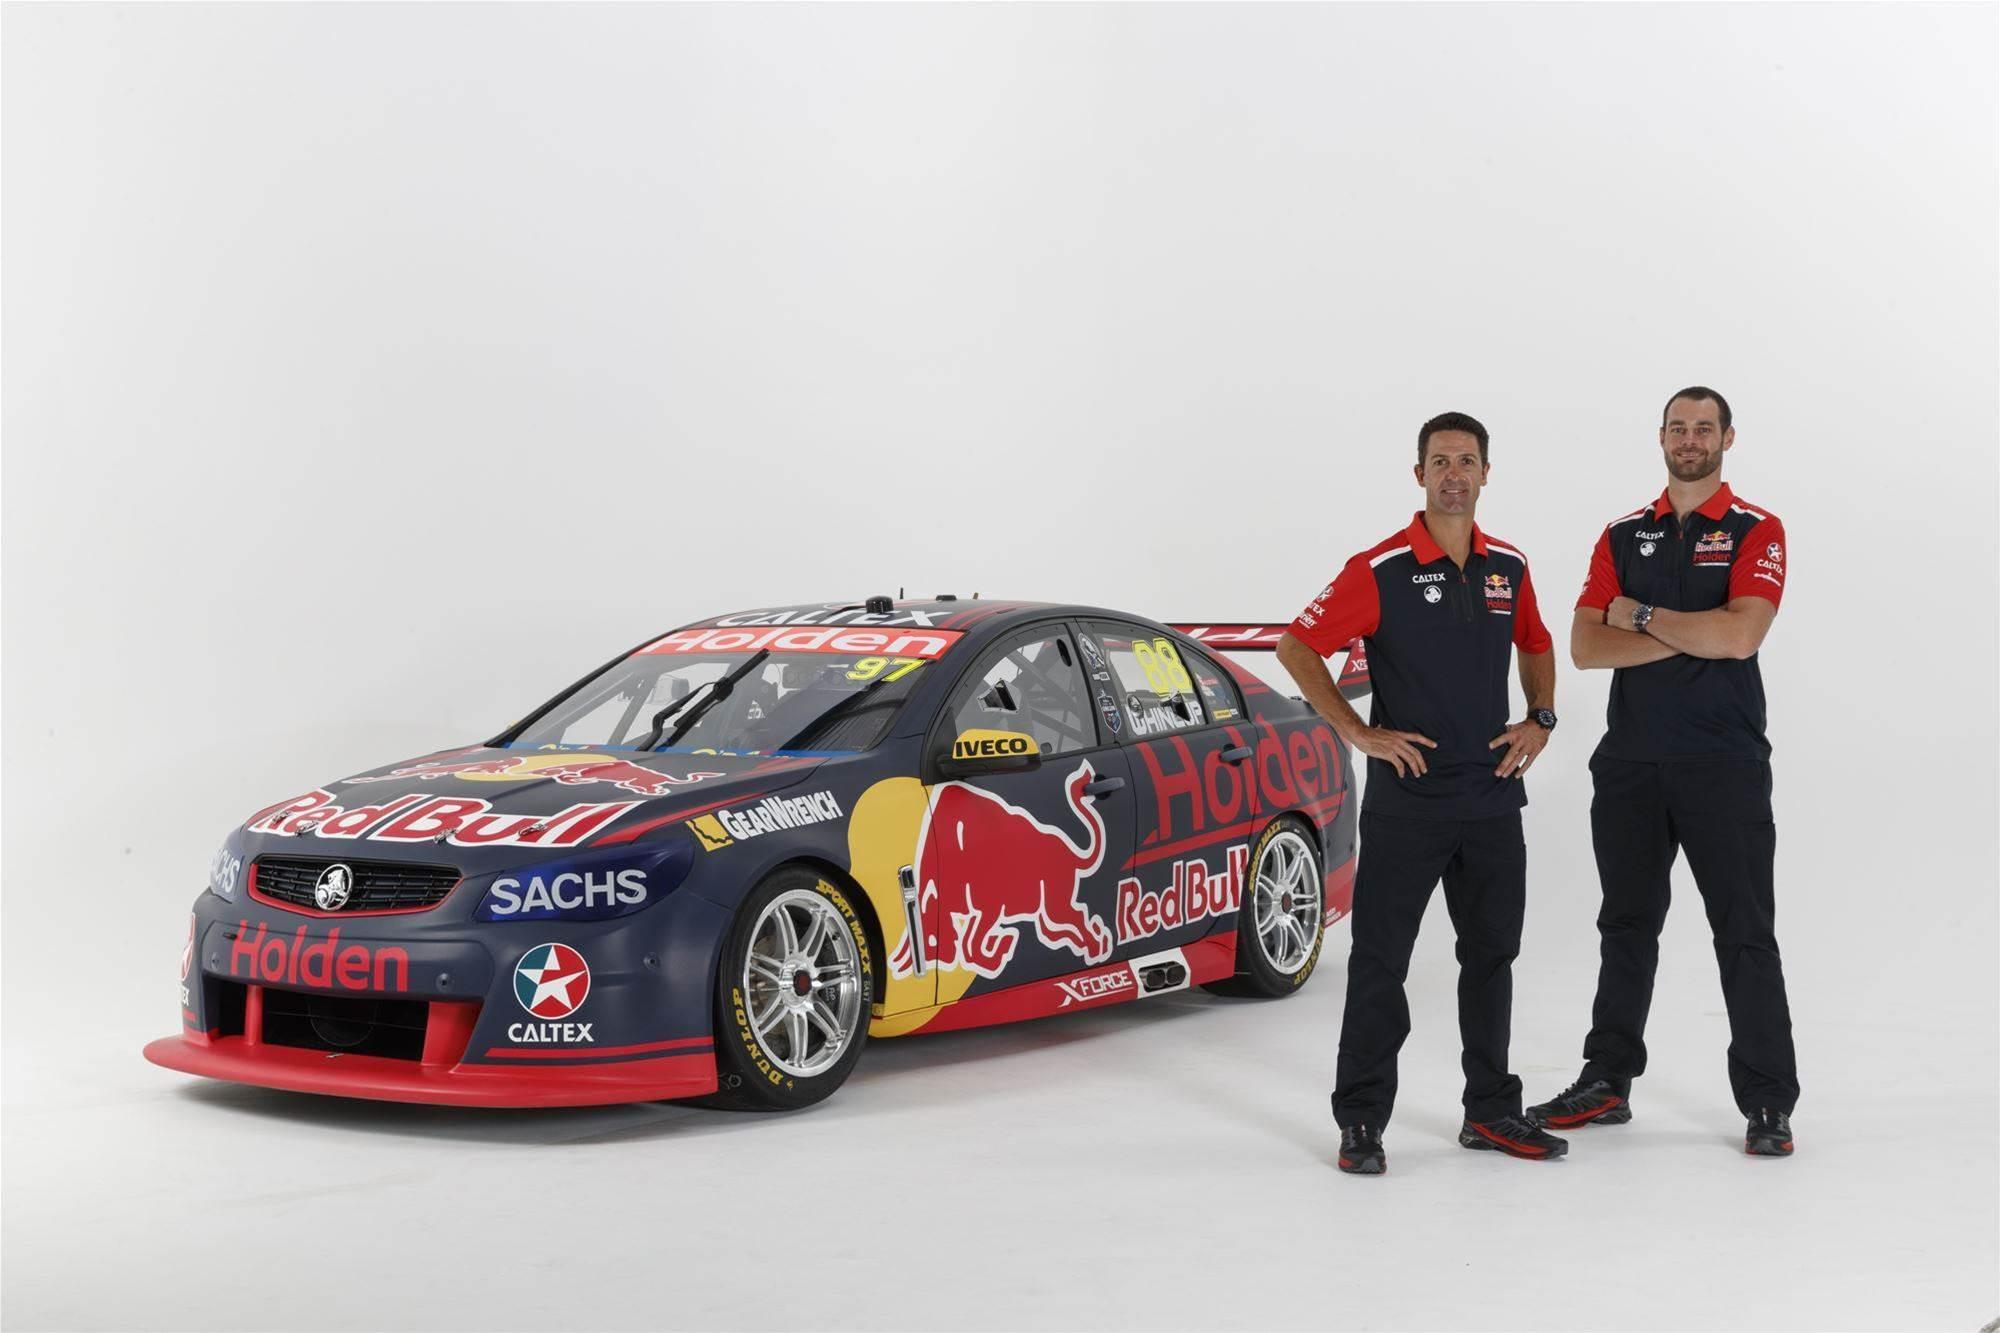 Red Bull HRT livery revealed